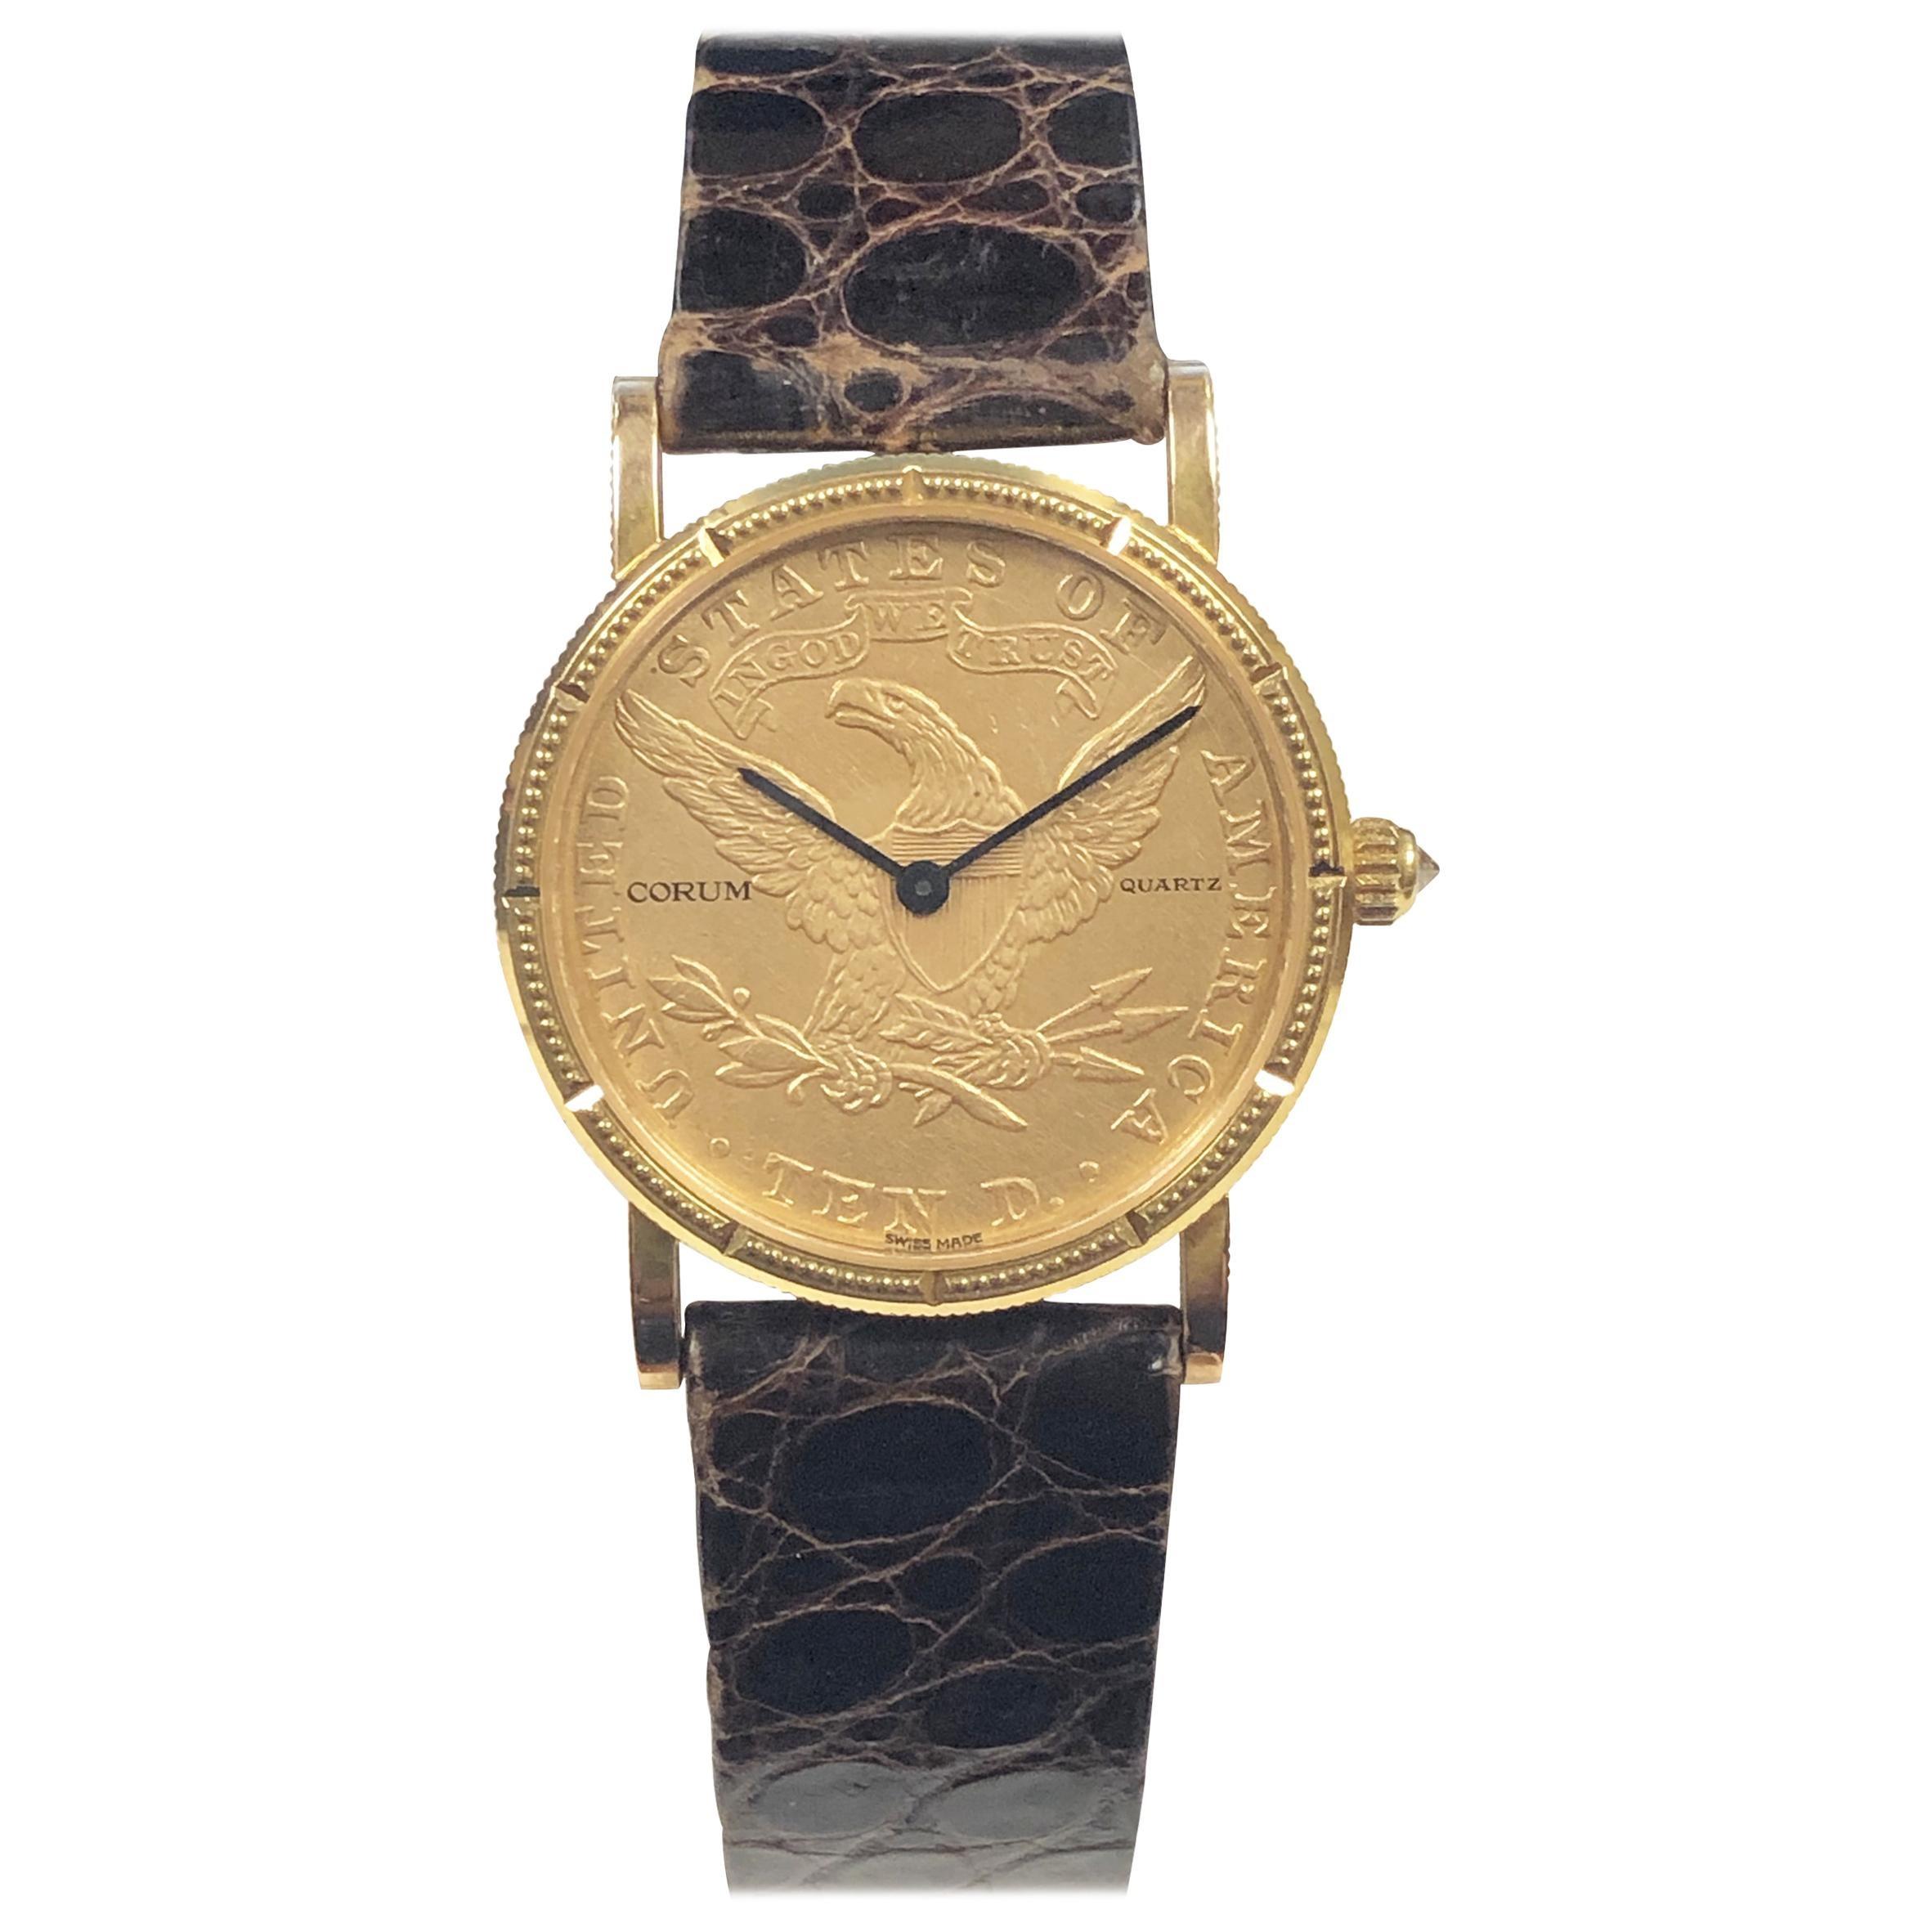 Corum $10 U.S. Gold Coin Quartz Wristwatch